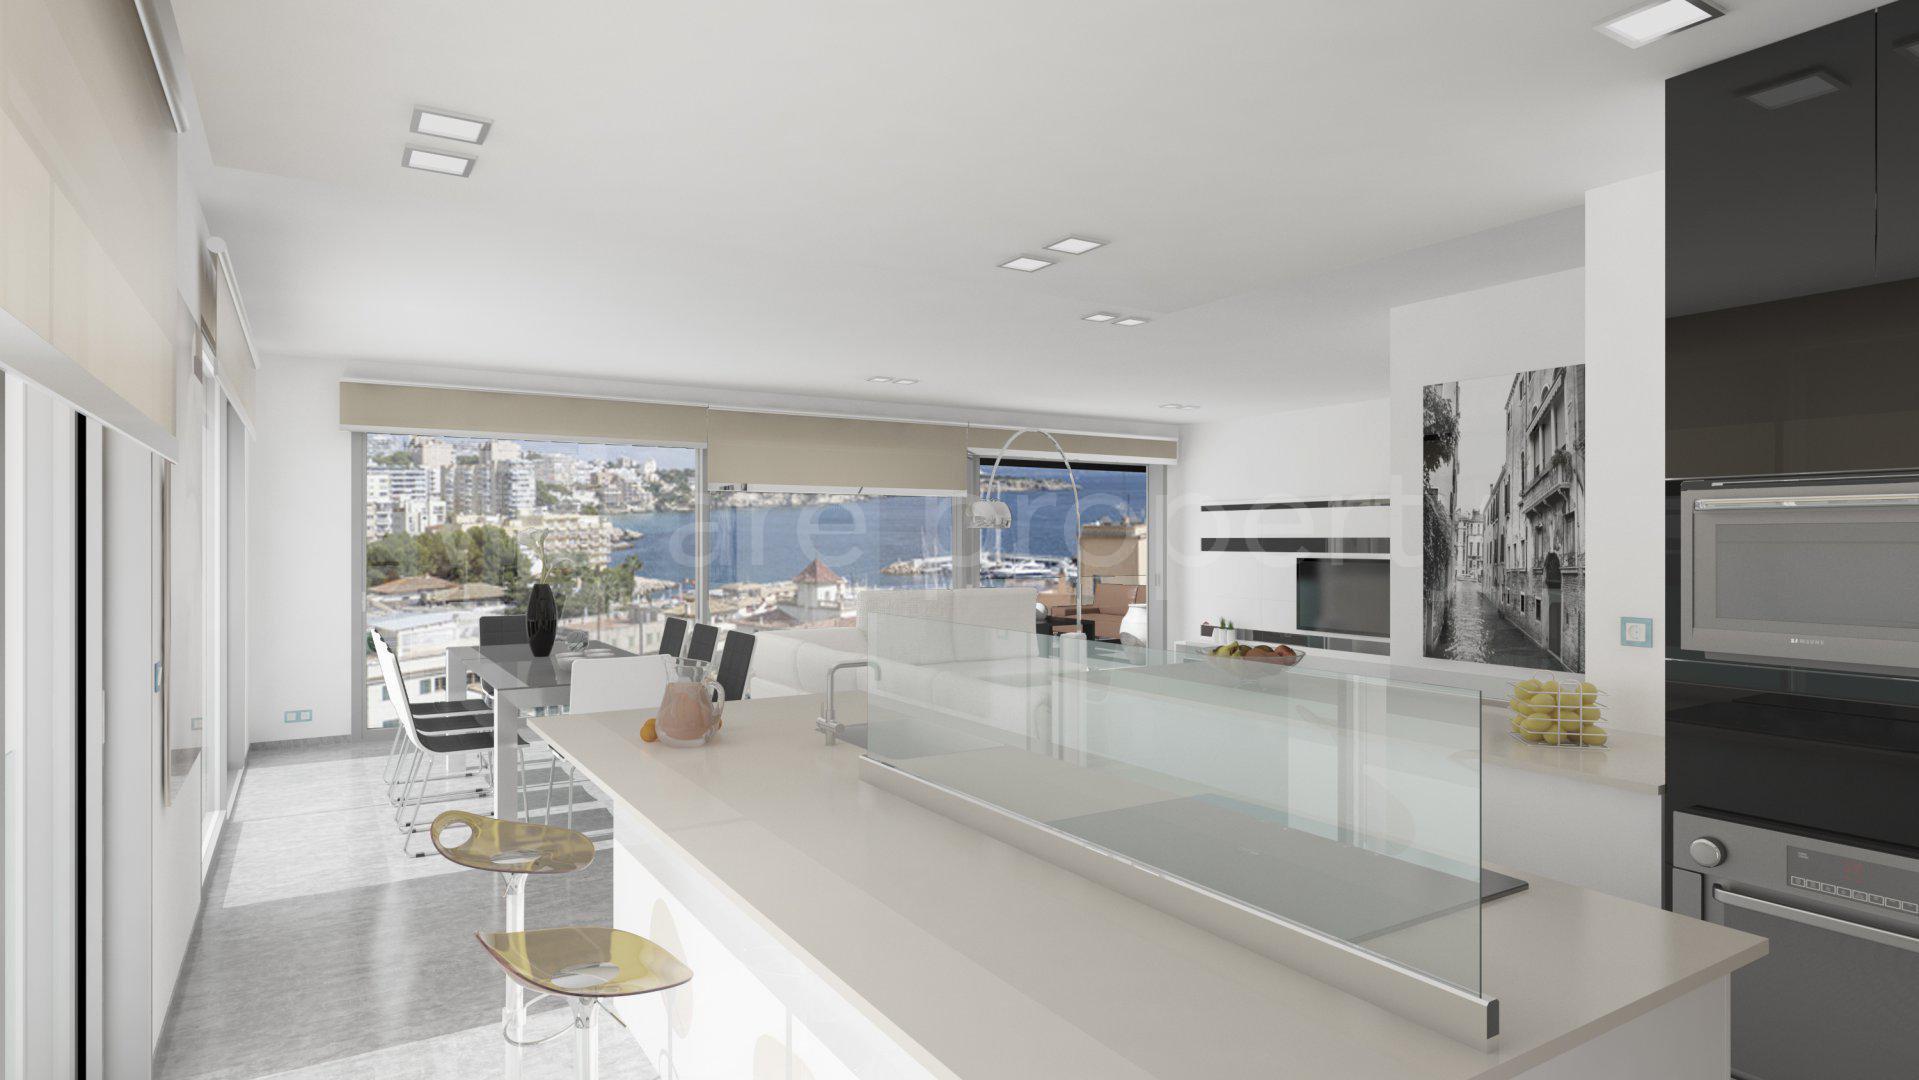 Elegante apartamento de obra nueva